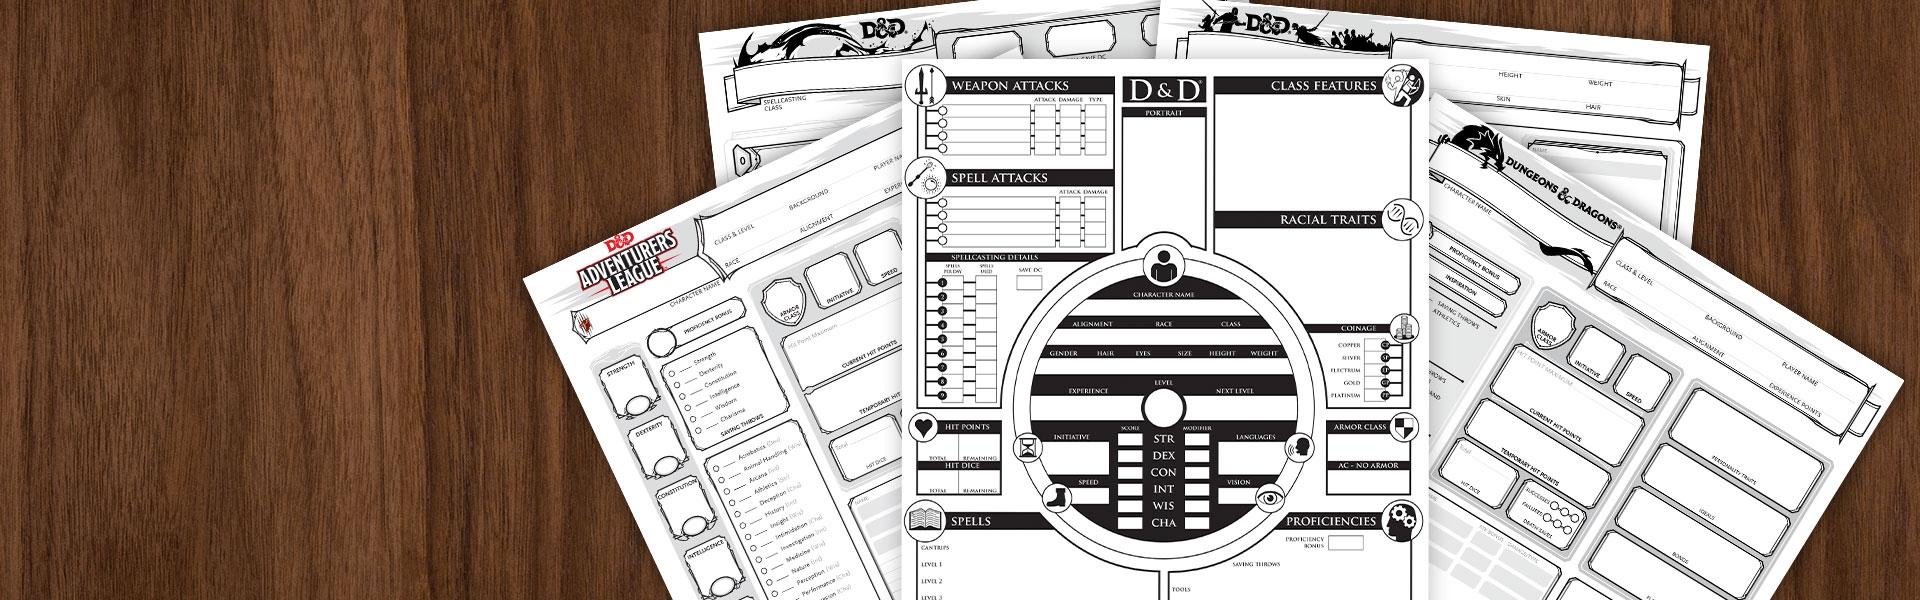 Template Printable Dnd Character Sheet Pdf